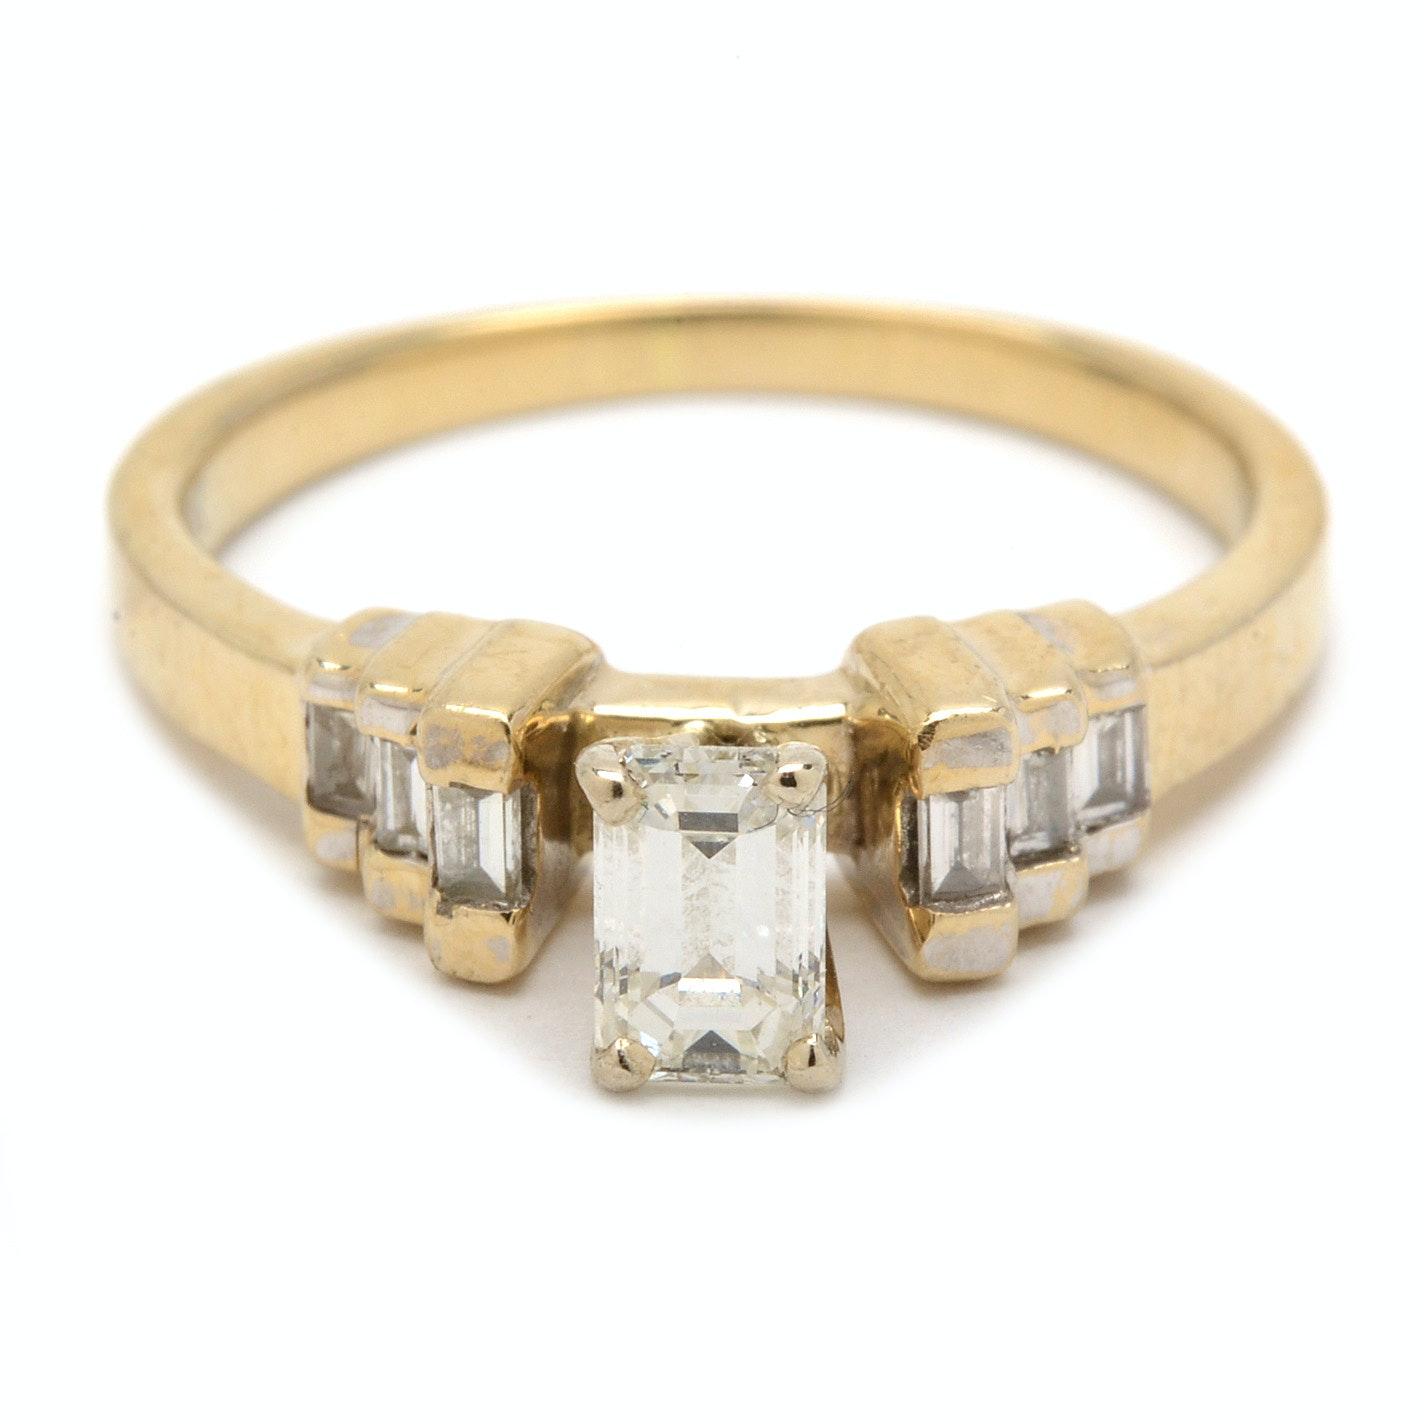 18K Yellow Gold Emerald Cut Diamond Ring